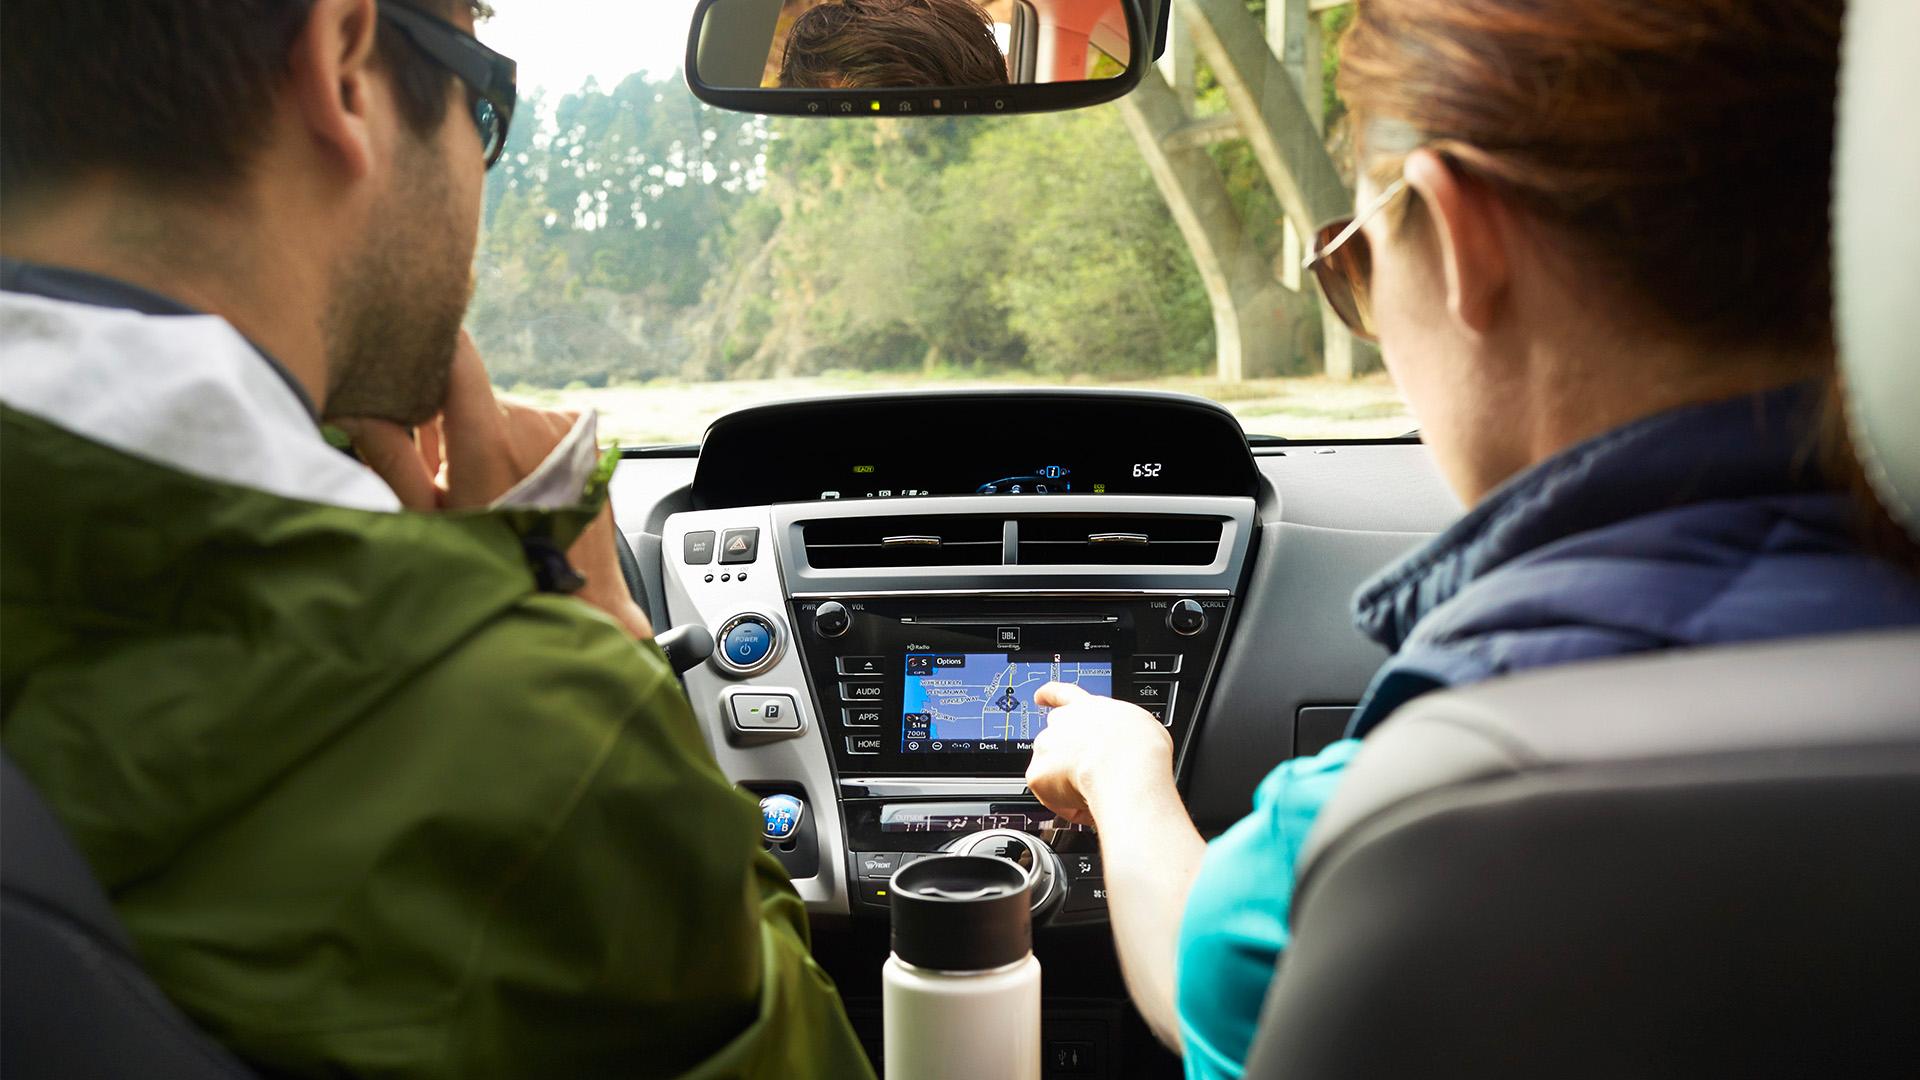 2016 Toyota Prius V navigation